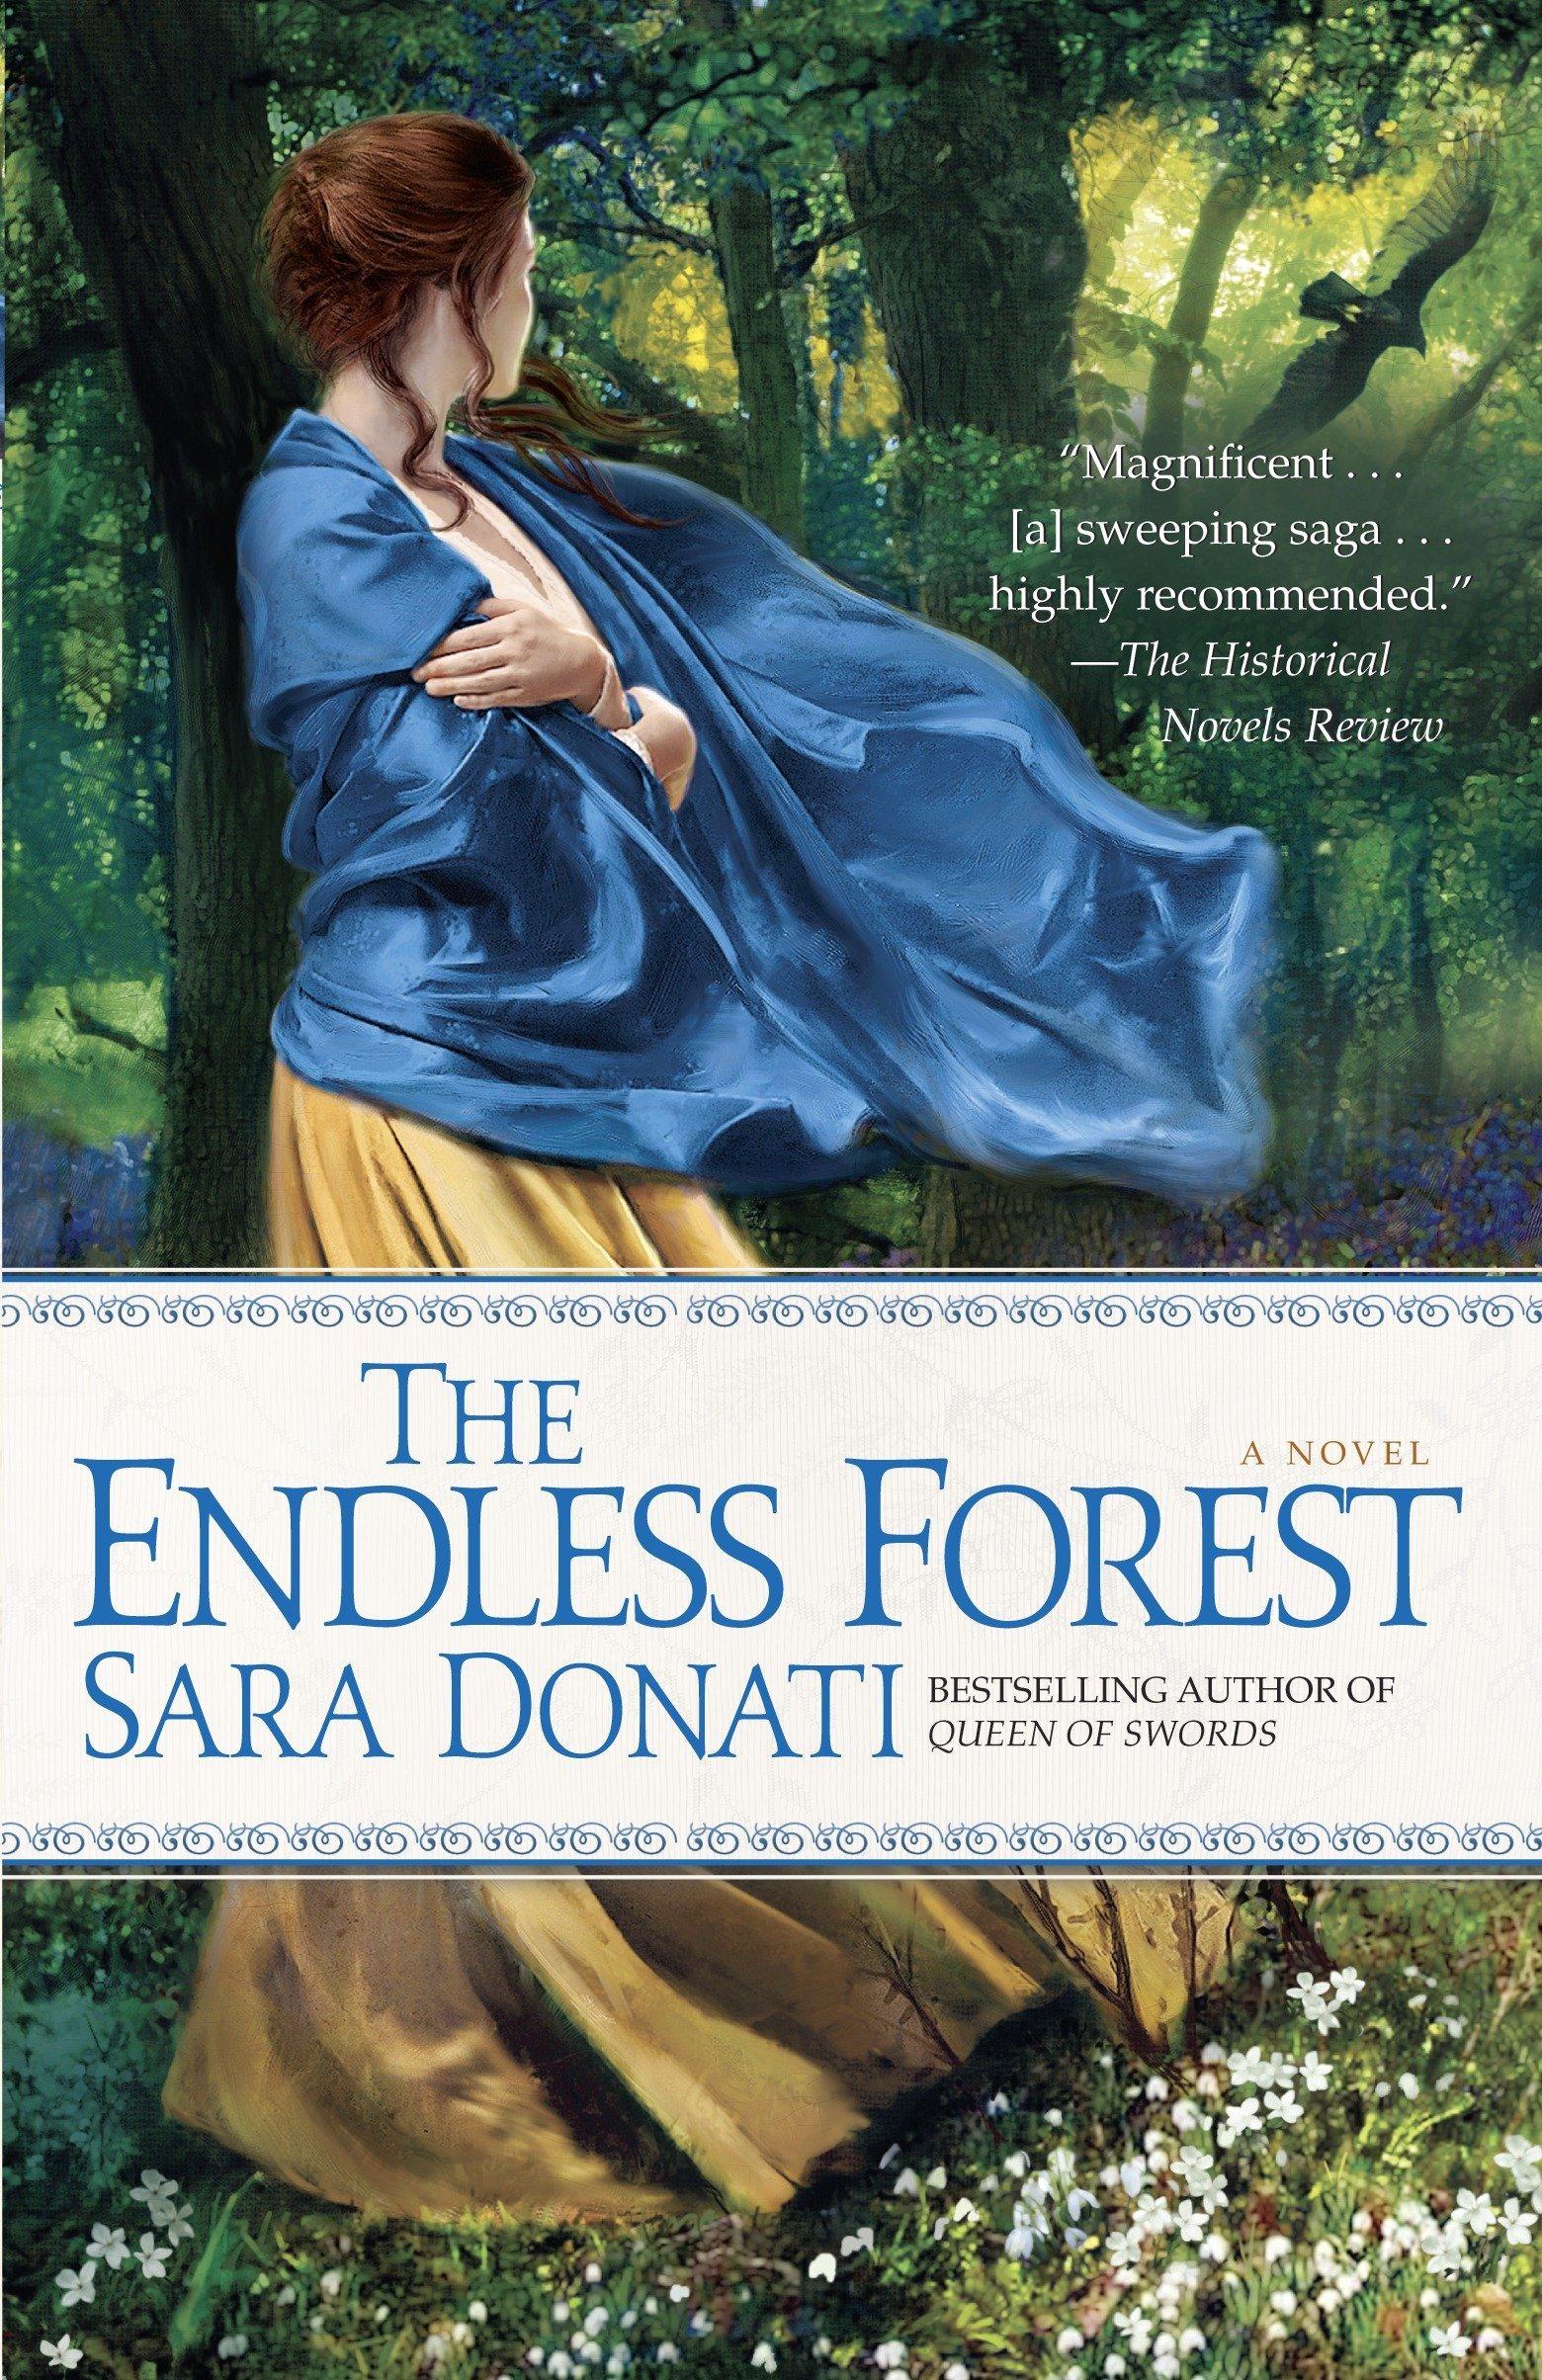 The Endless Forest: A Novel (Wilderness)